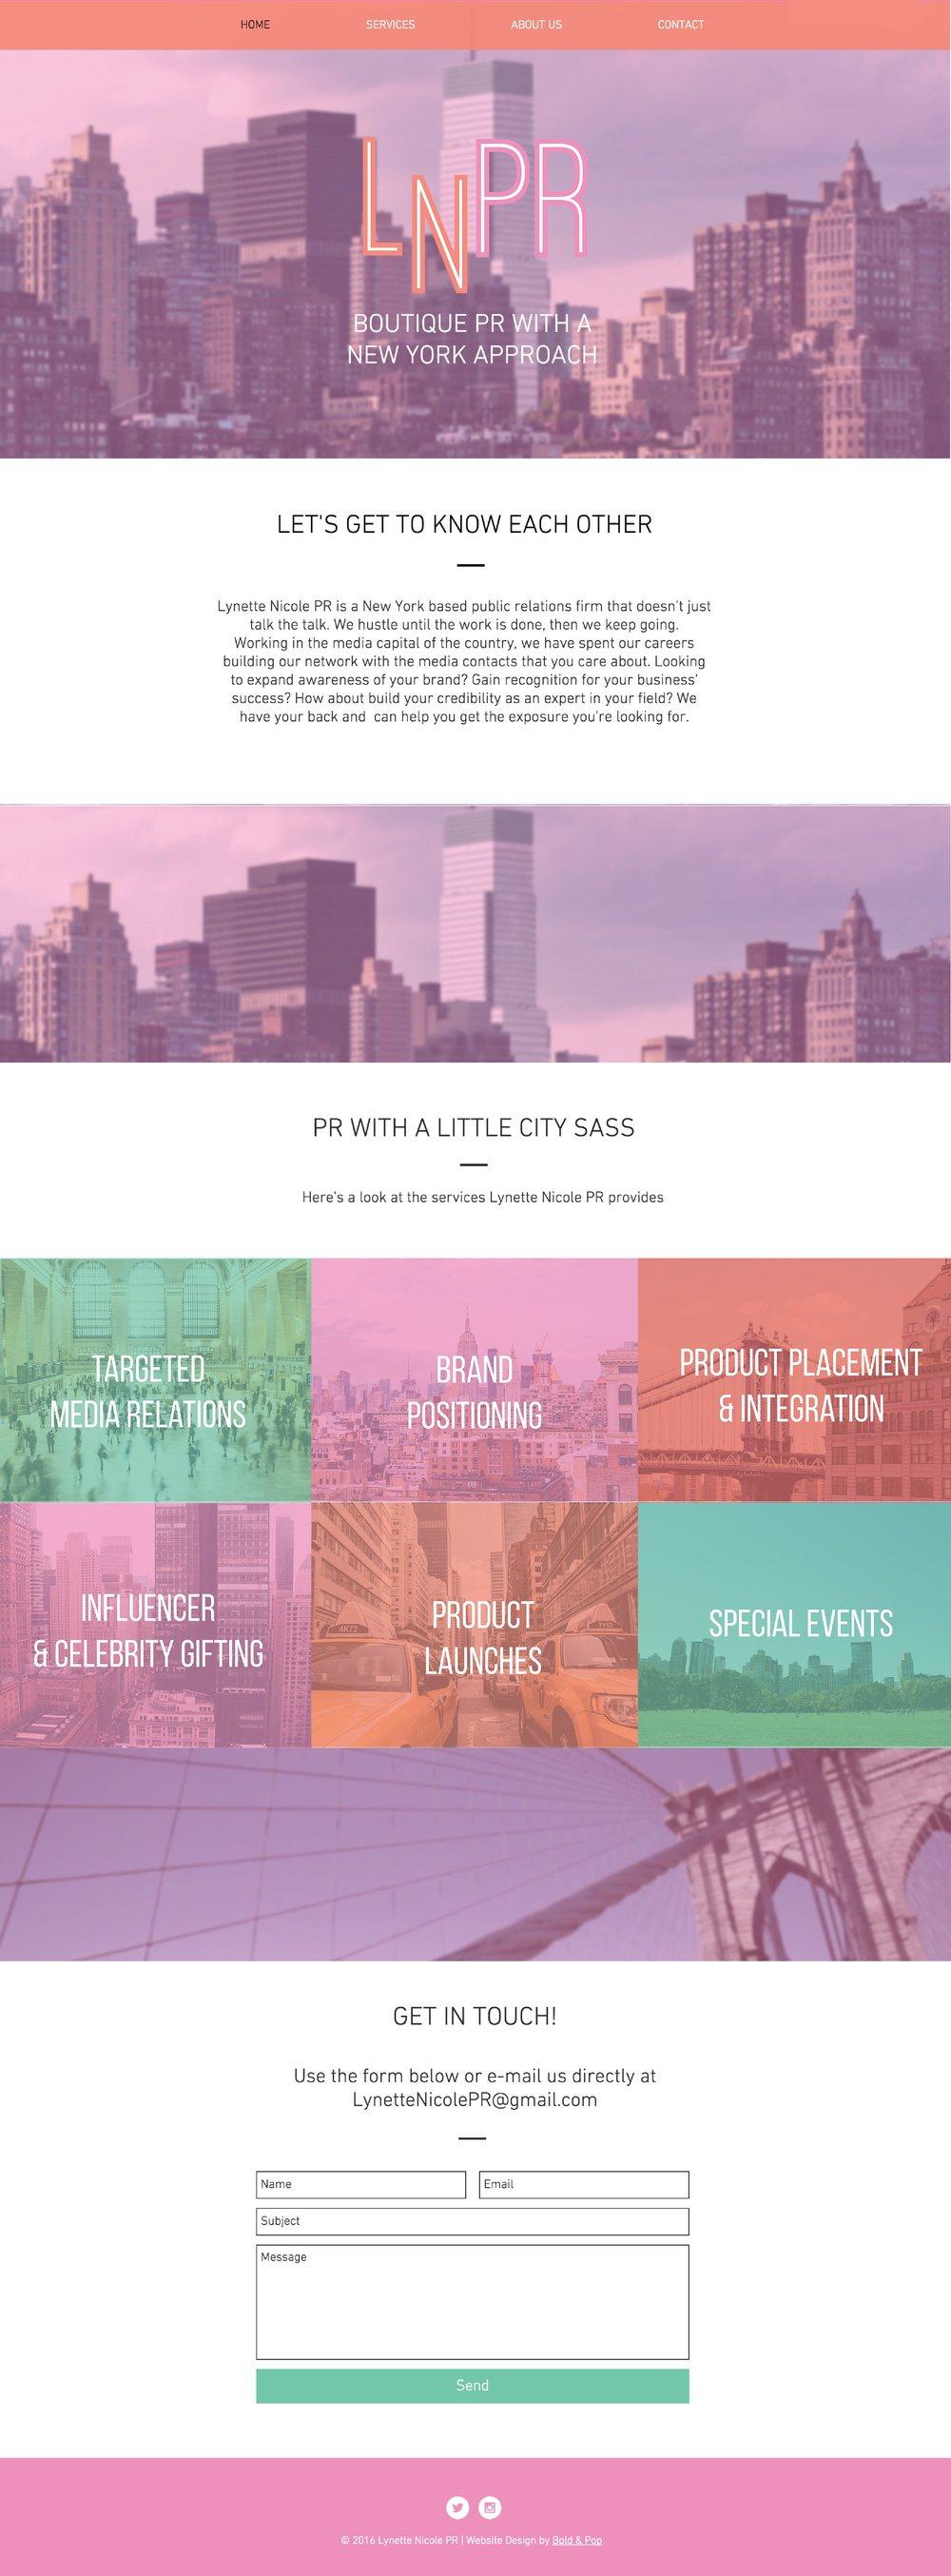 Public Relations Agency Branding & Website Design